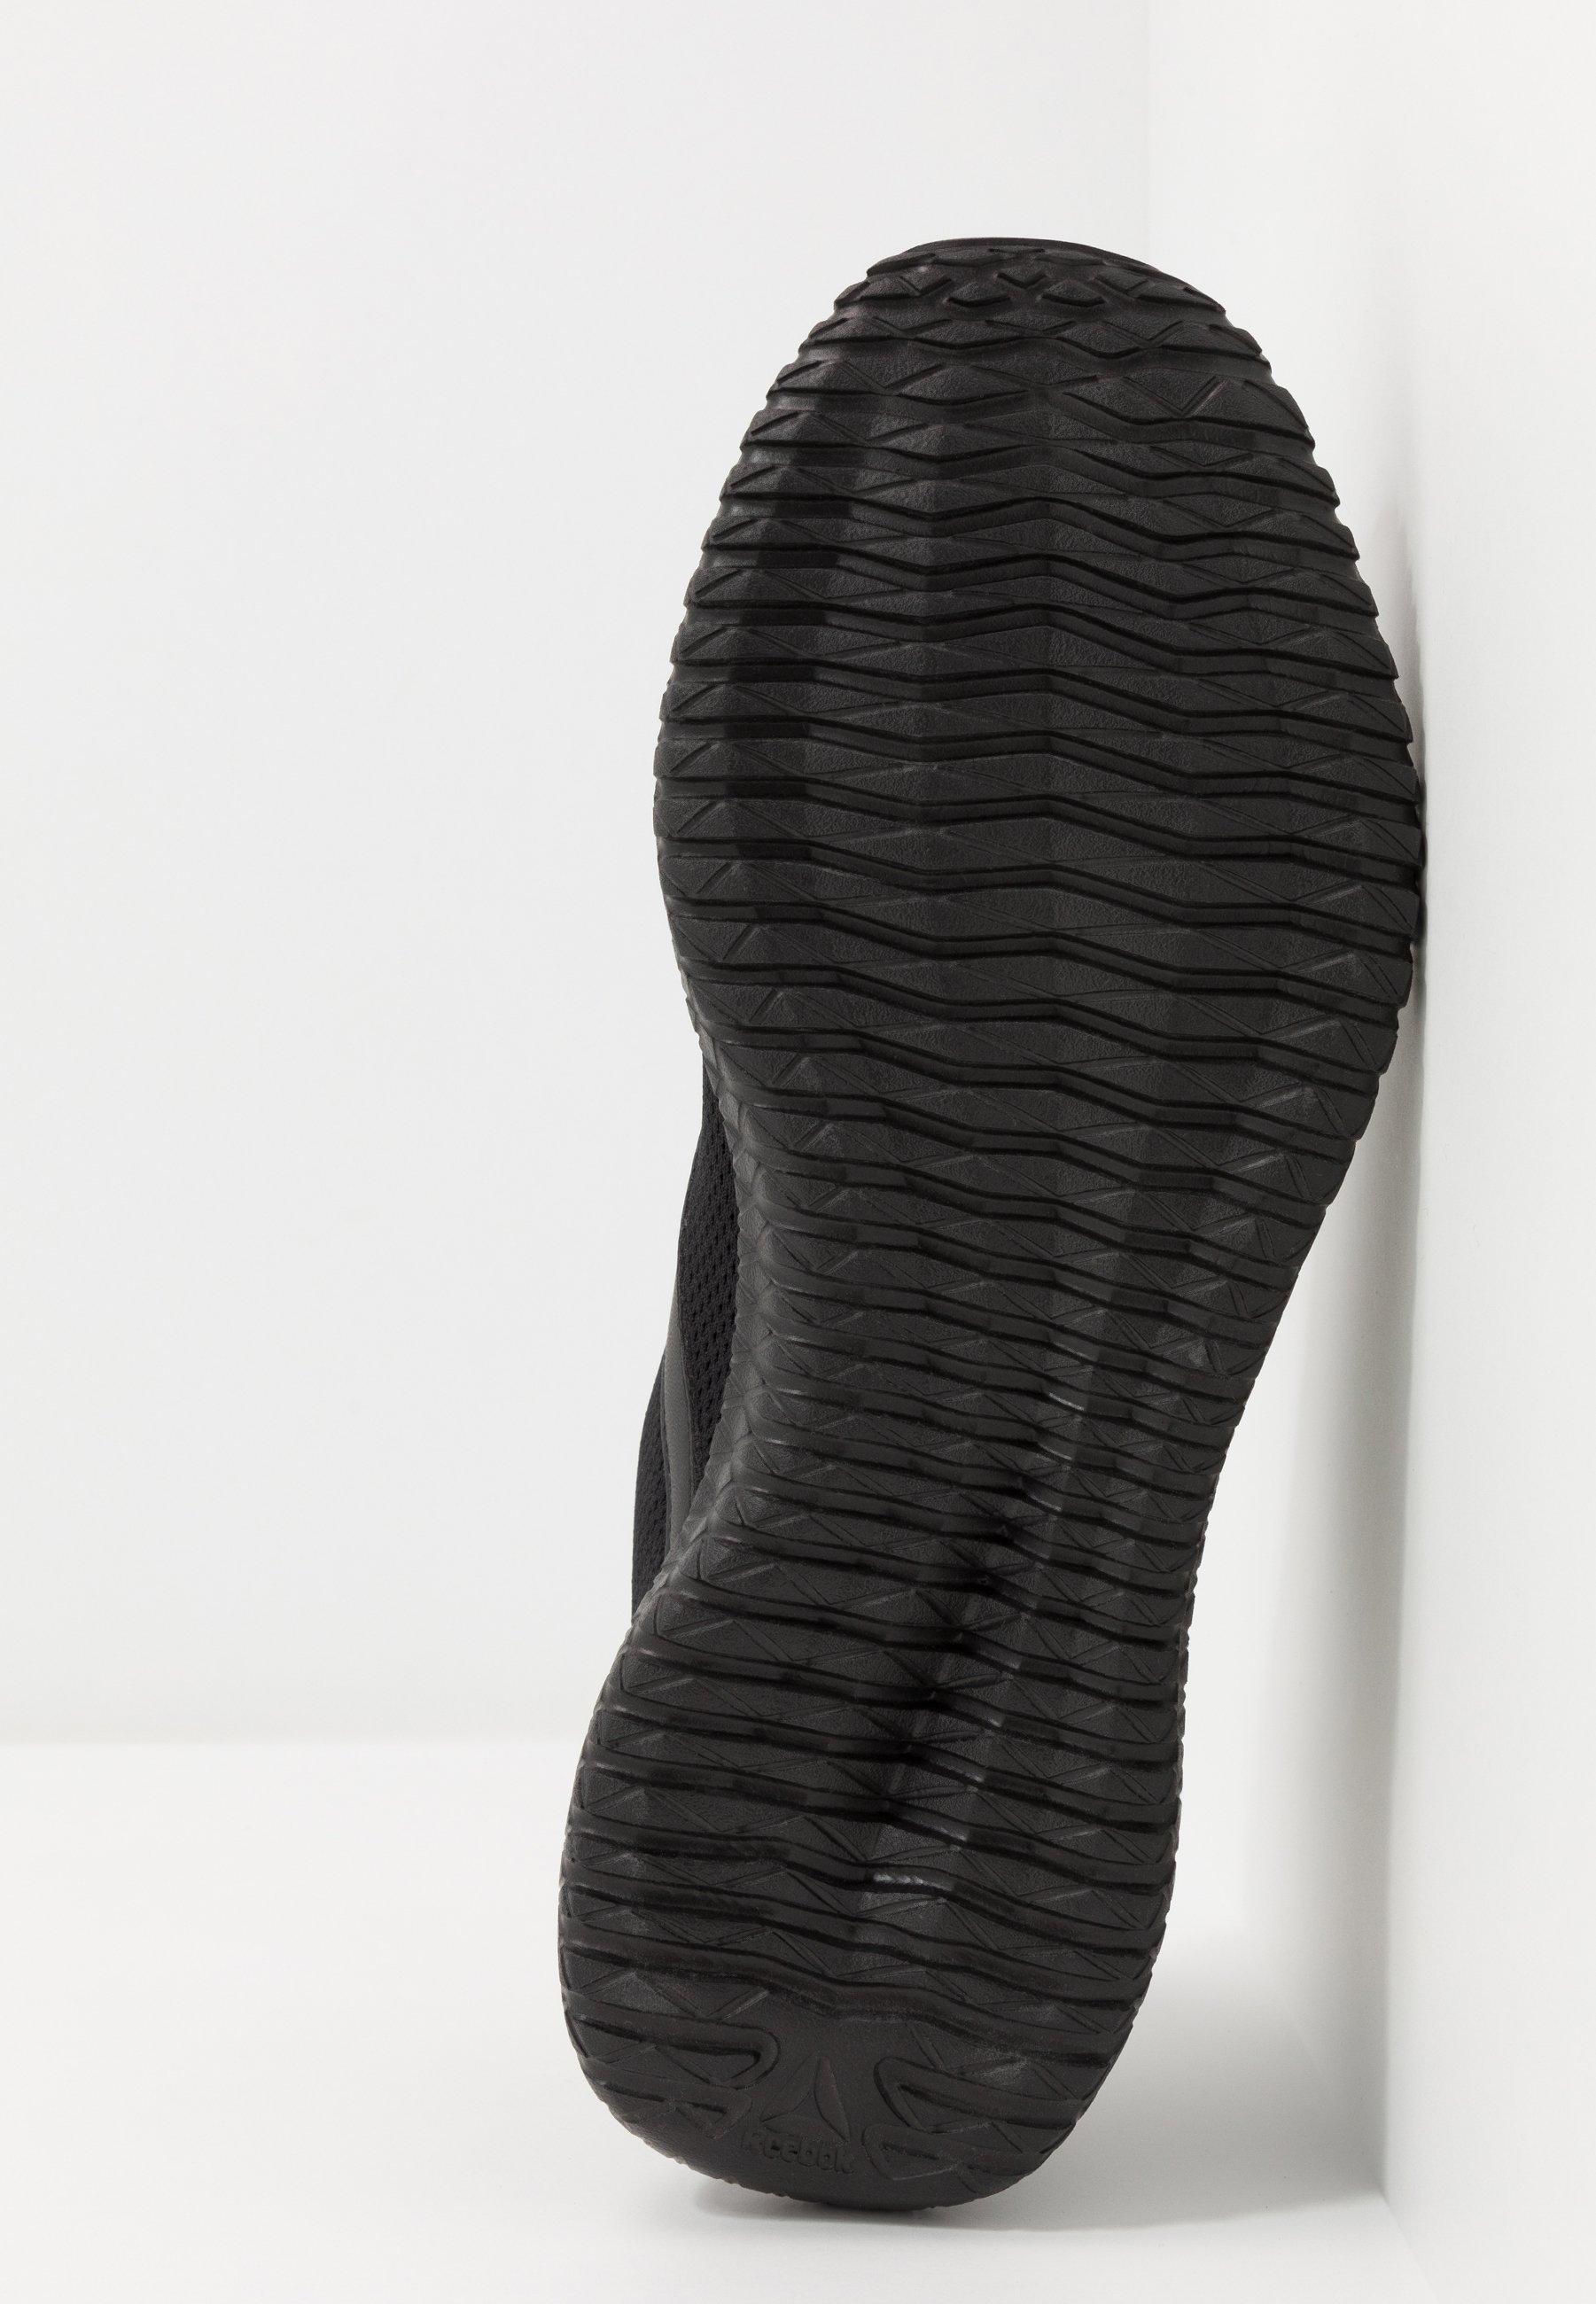 Factory Outlet Great Deals Women's Shoes Reebok FLEXAGON ENERGY TR 2.0 Sports shoes black BvsNO8XLY BeIOnx4Jb